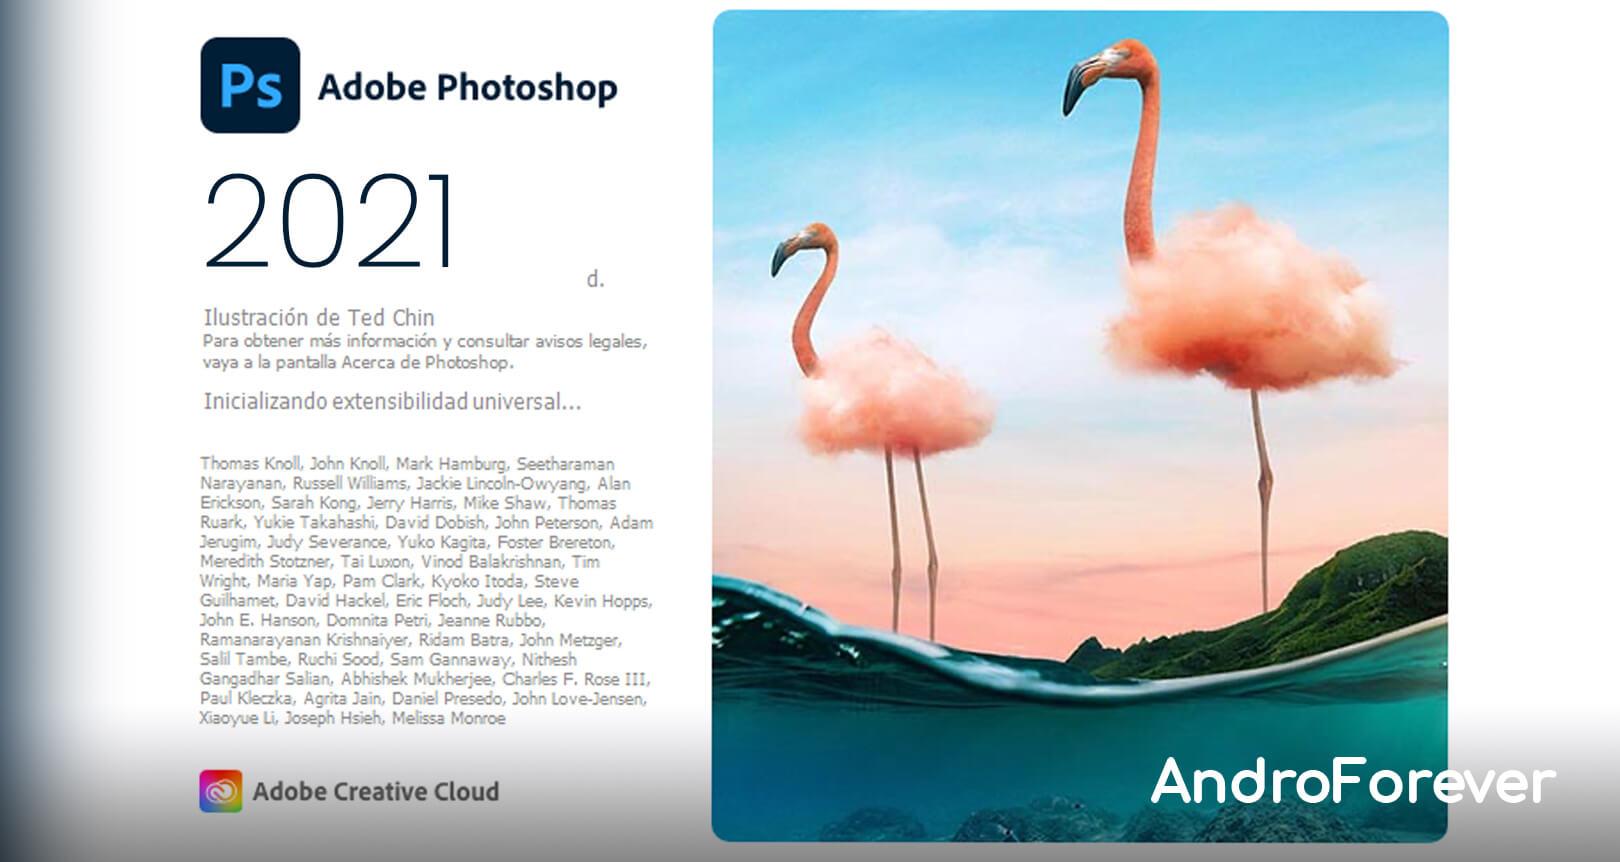 Download Free ᐈ Adobe Photoshop CC 2021 v22.3.1.122 ᐈ Download FULL [ENGLISH]  - Last Version 2021